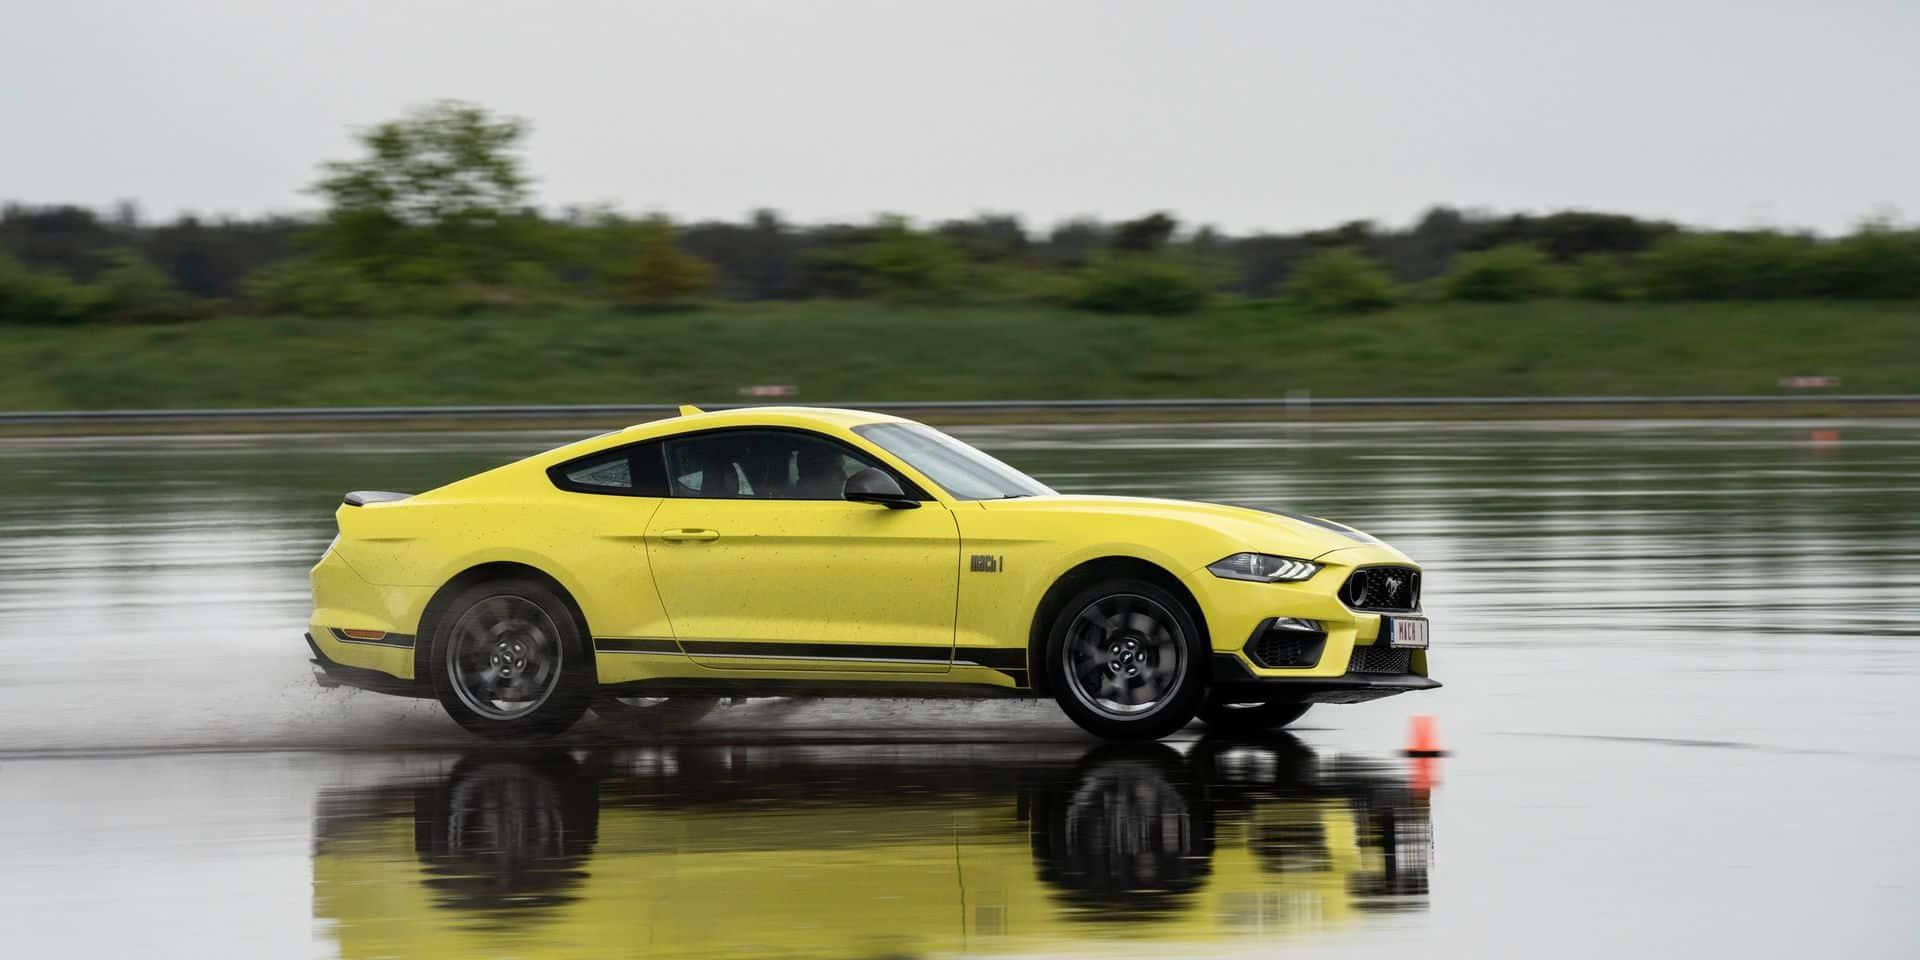 Essai ford Mustang Mach 1 : il y a Mach et Mach…